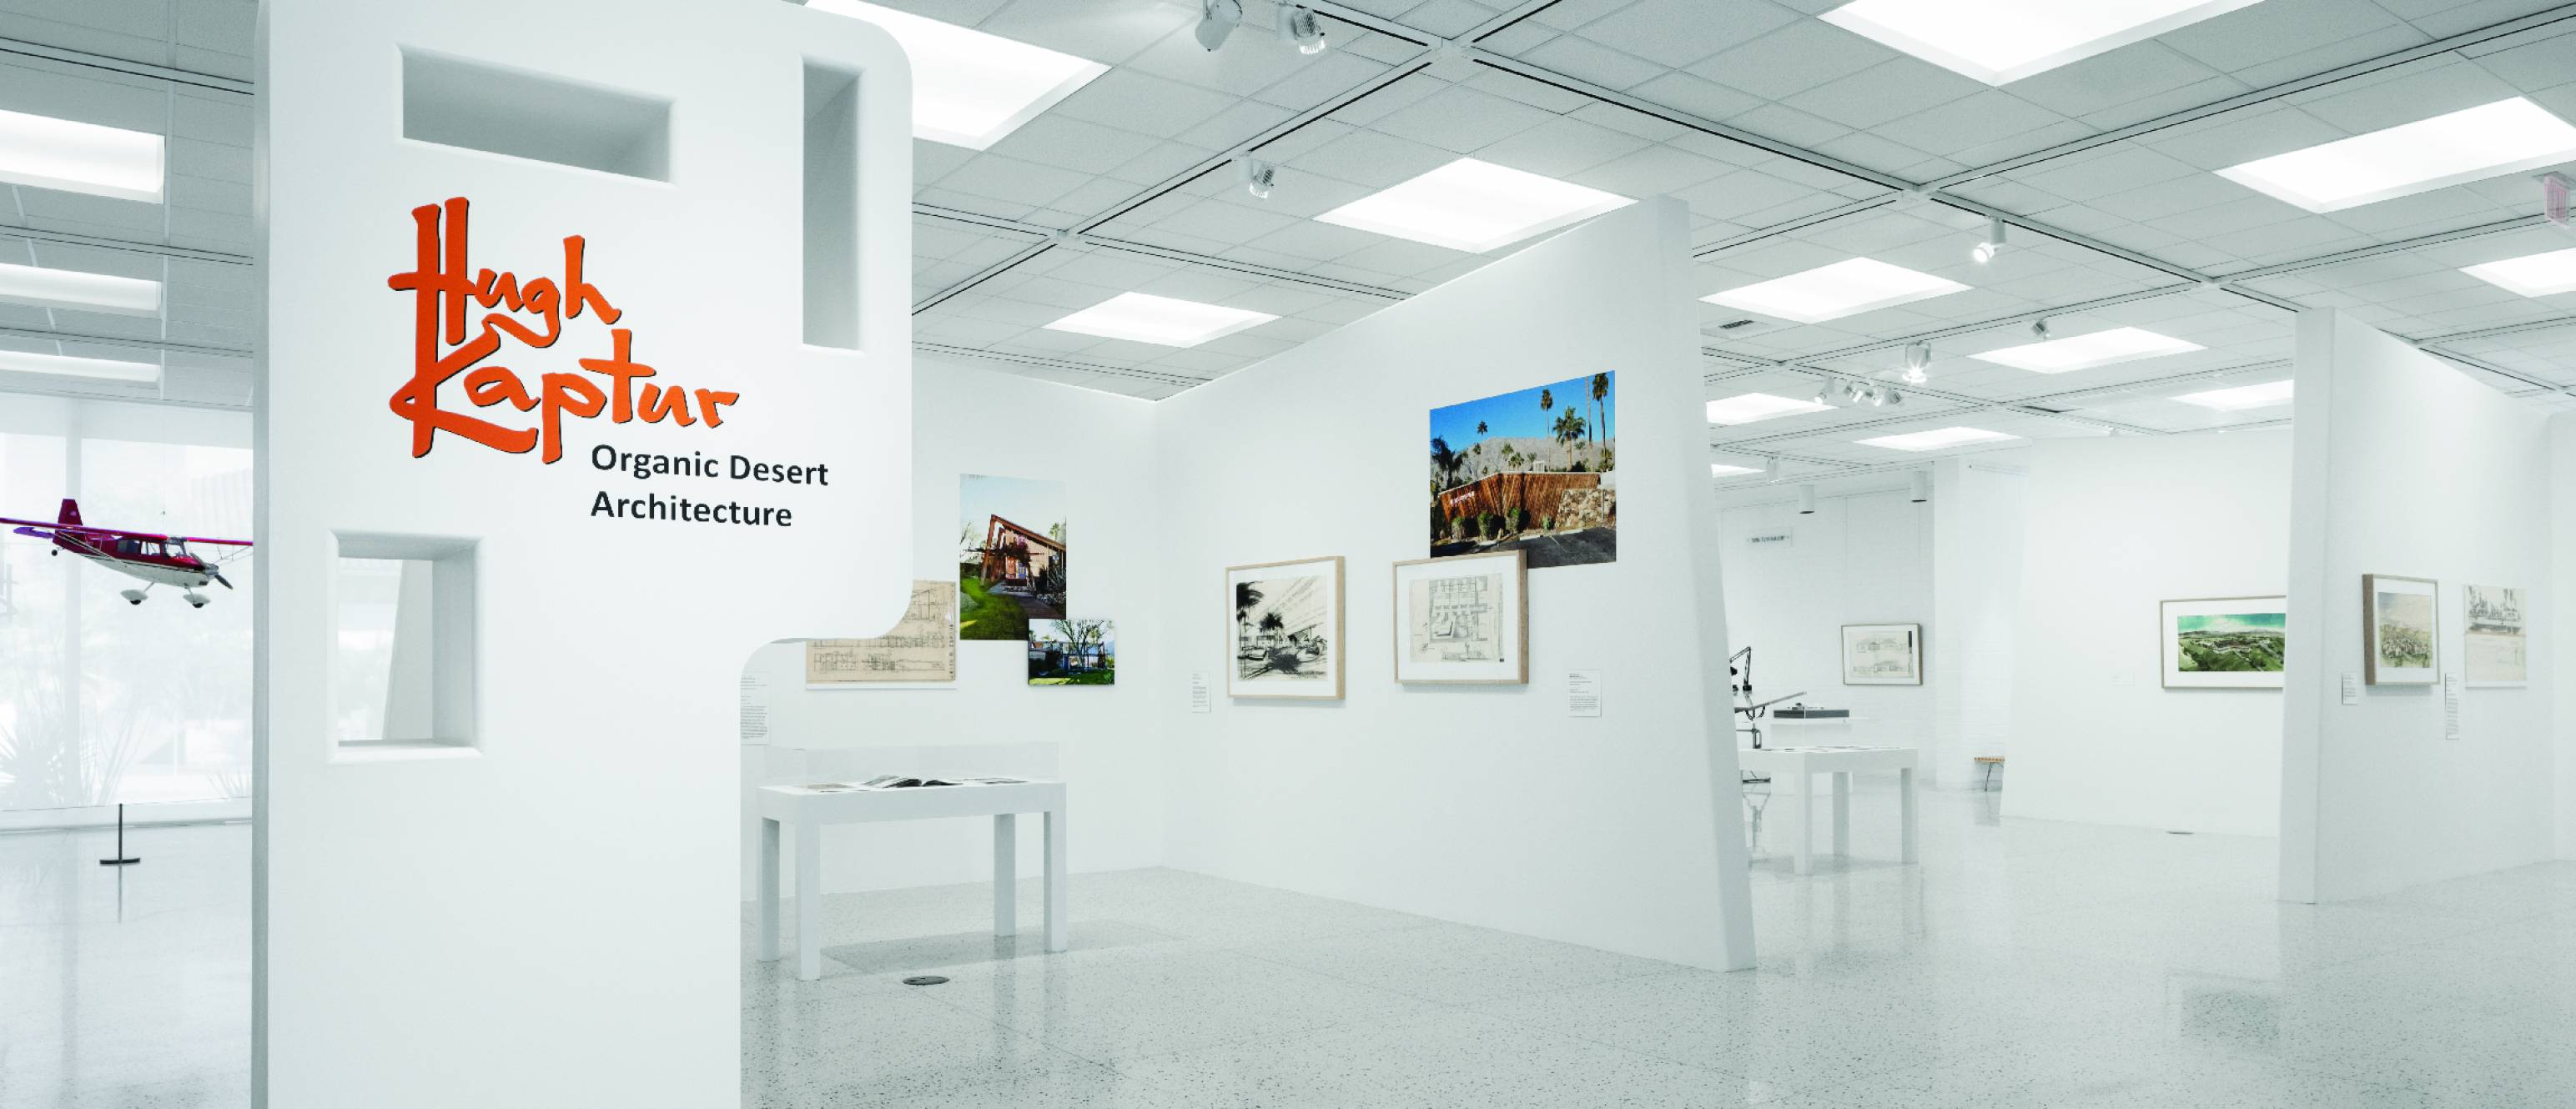 Hugh Kaptur Exhibition picture